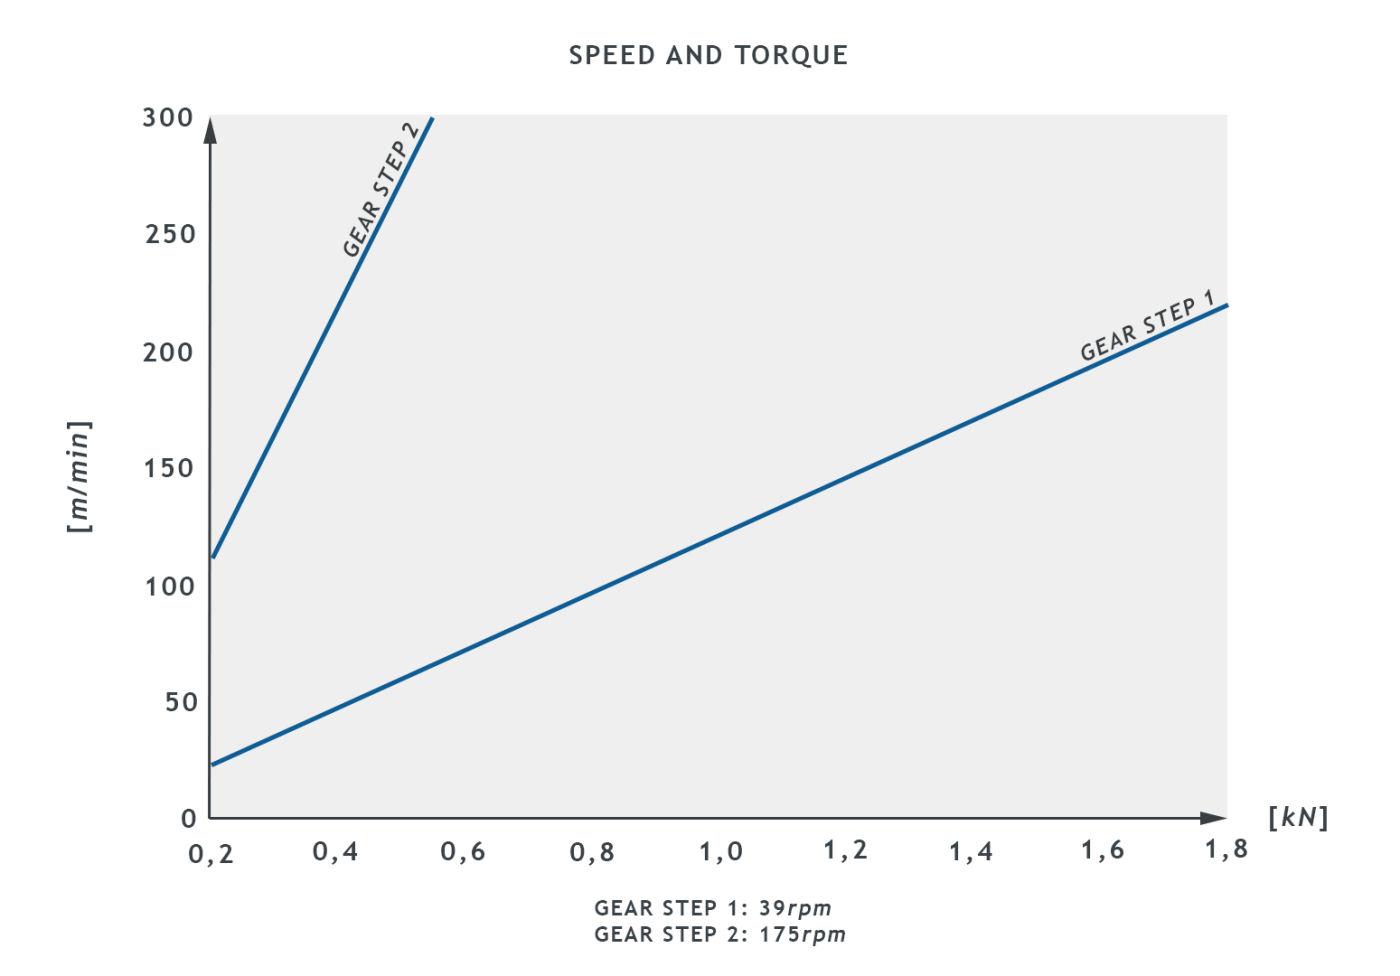 AVR6_SB0405002_SpeedTorque_graph1.jpg